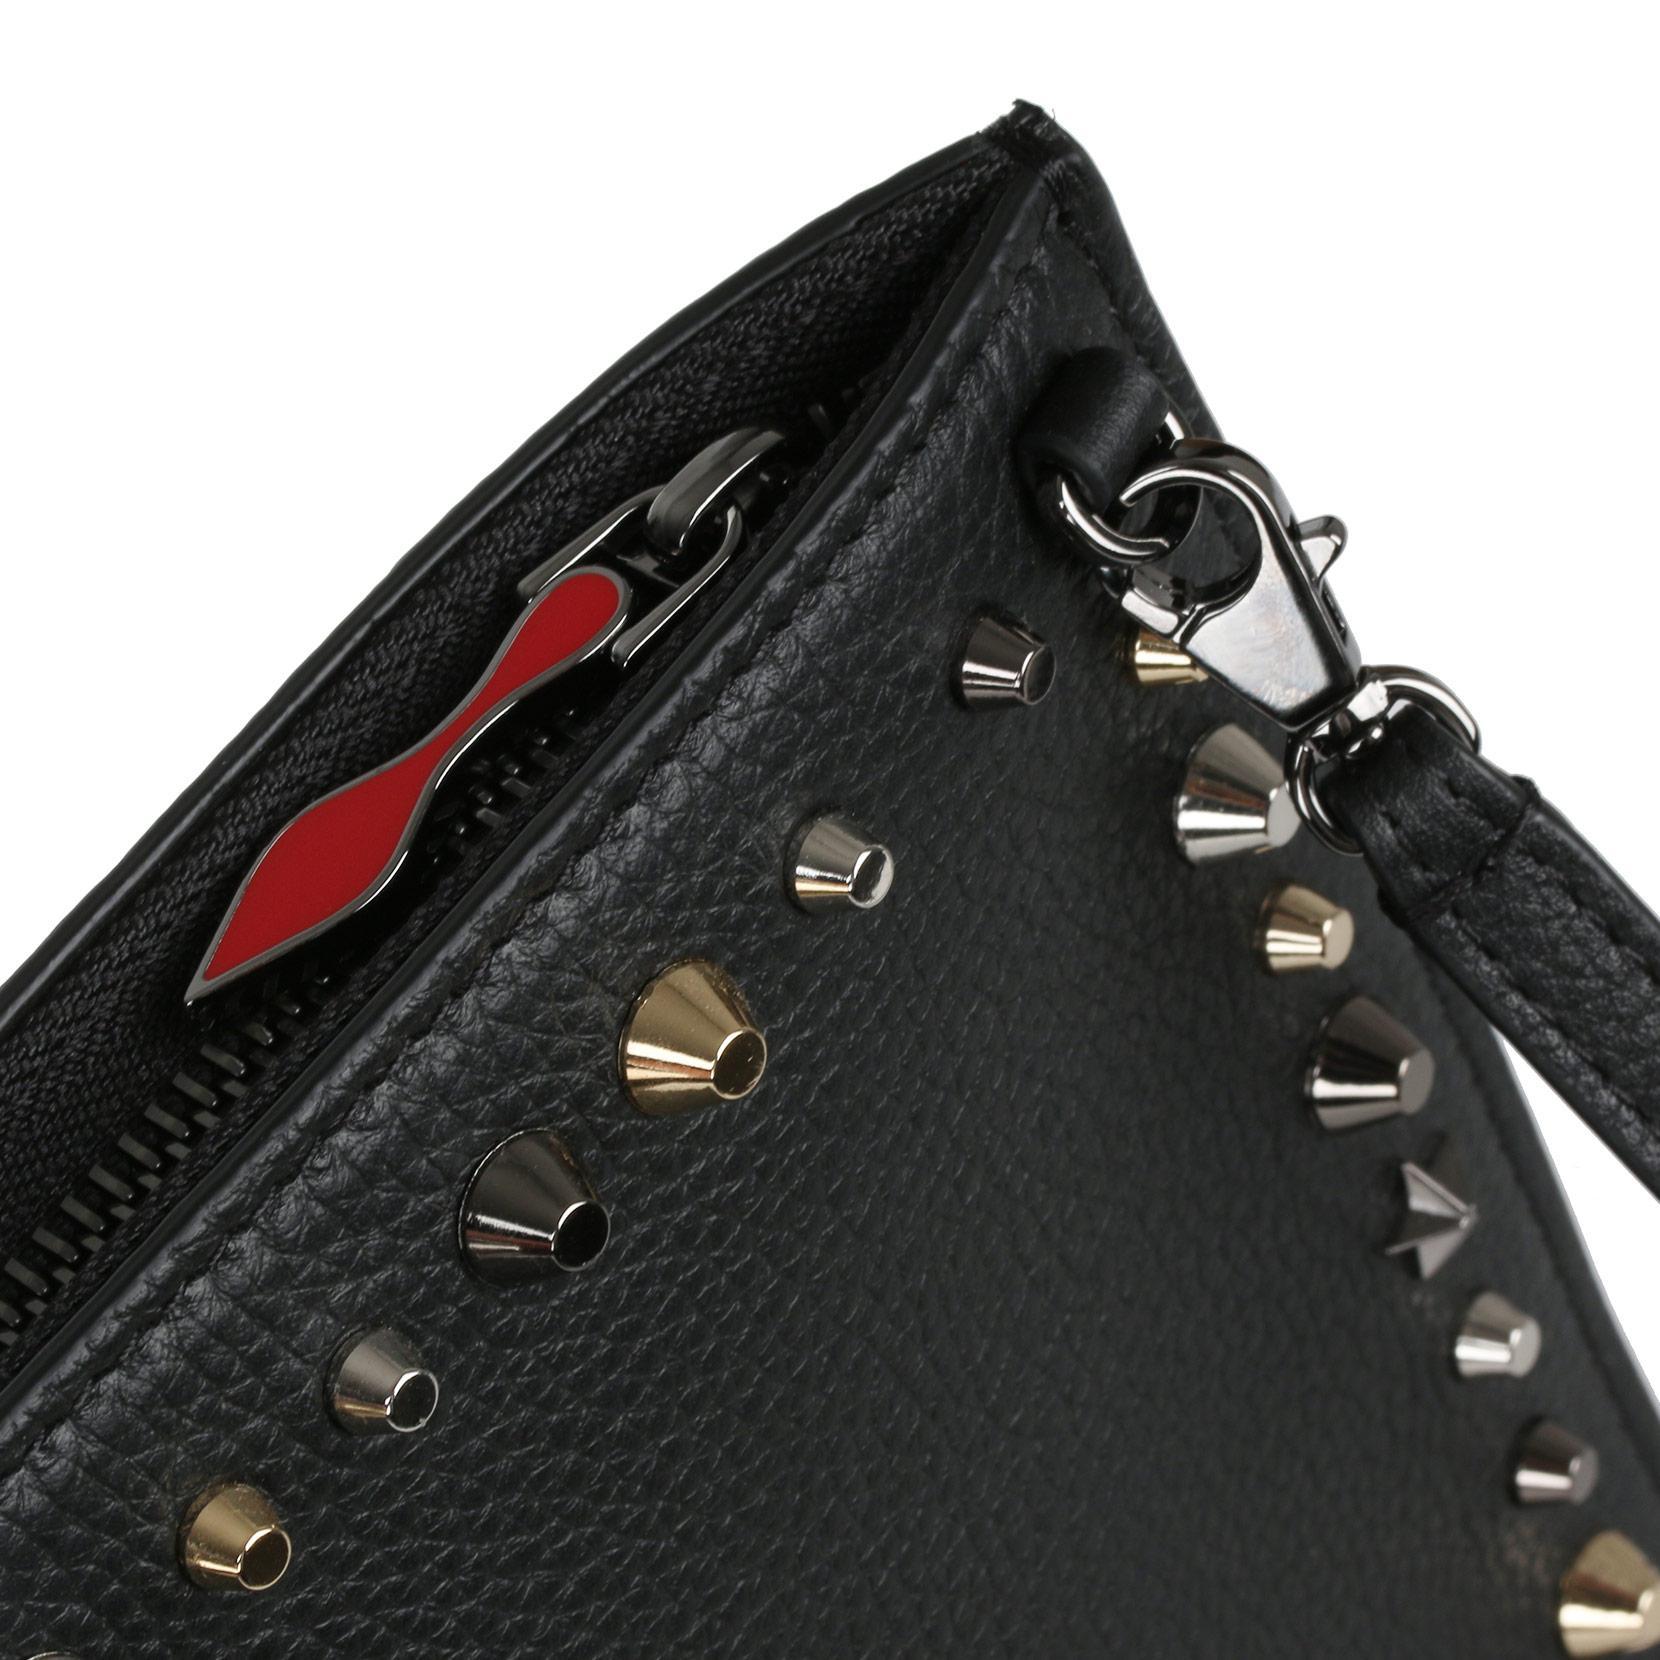 Loubiclutch Creative Leather Clutch Christian Louboutin LrtUlWGv